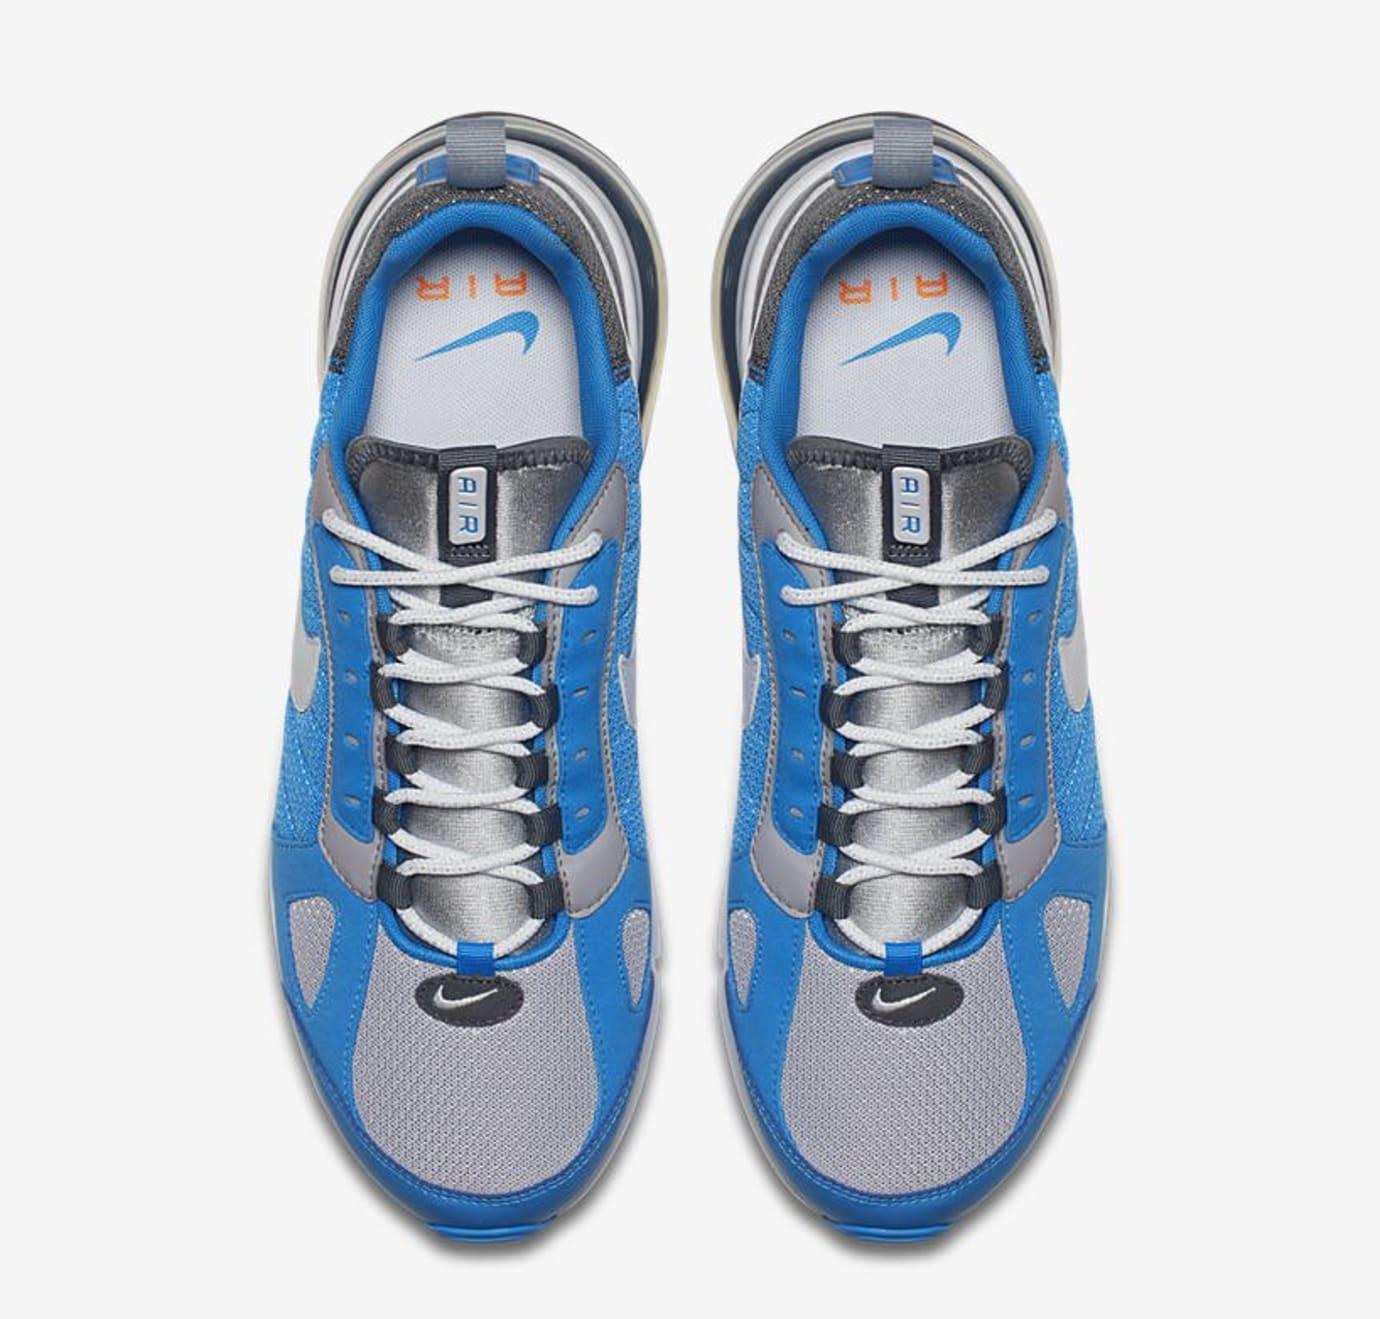 Nike Air Max 270 Futura (Top)